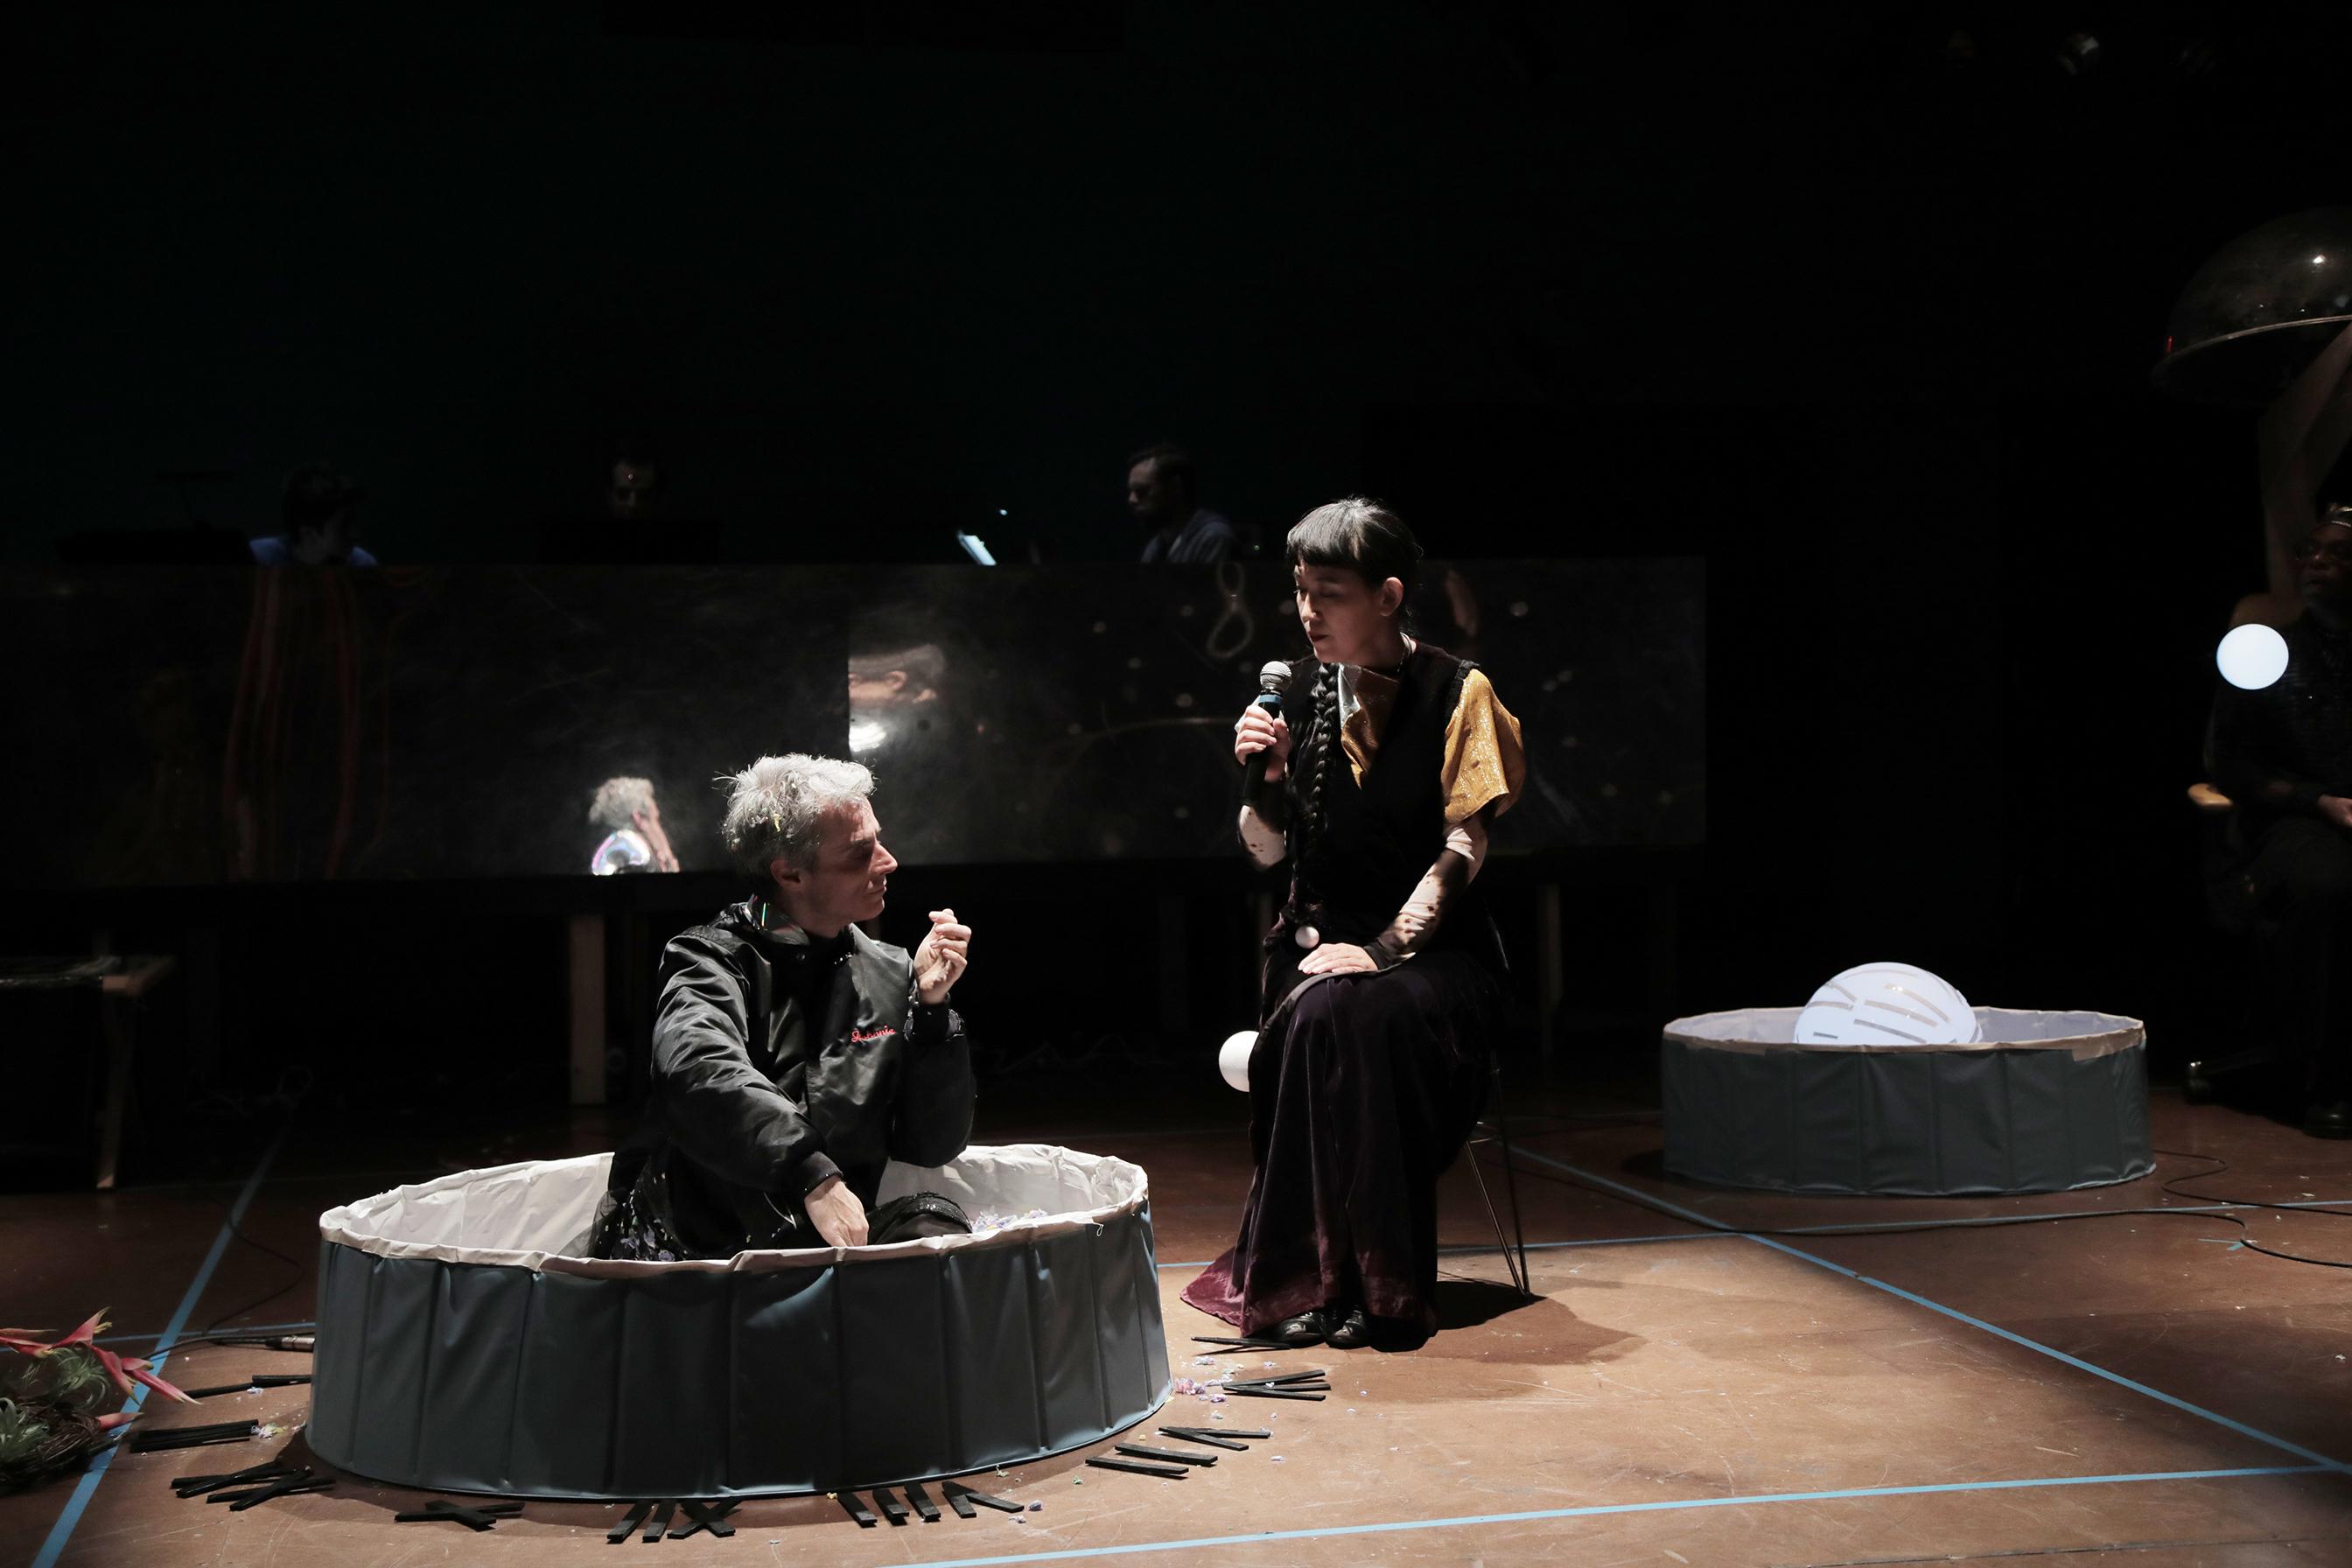 performers seated onstage